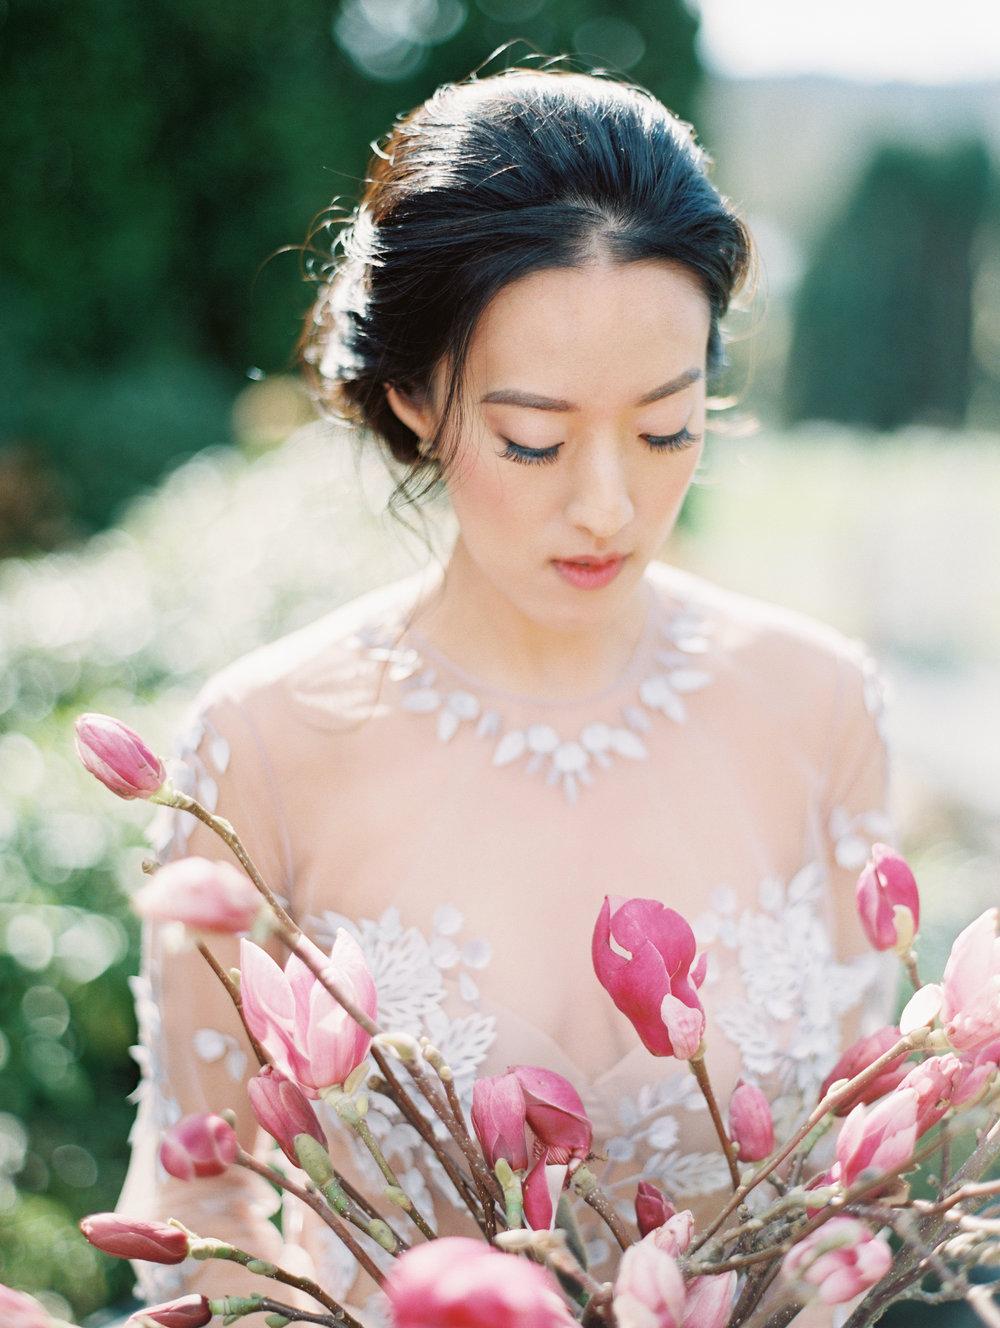 Magnolia_0099.jpg